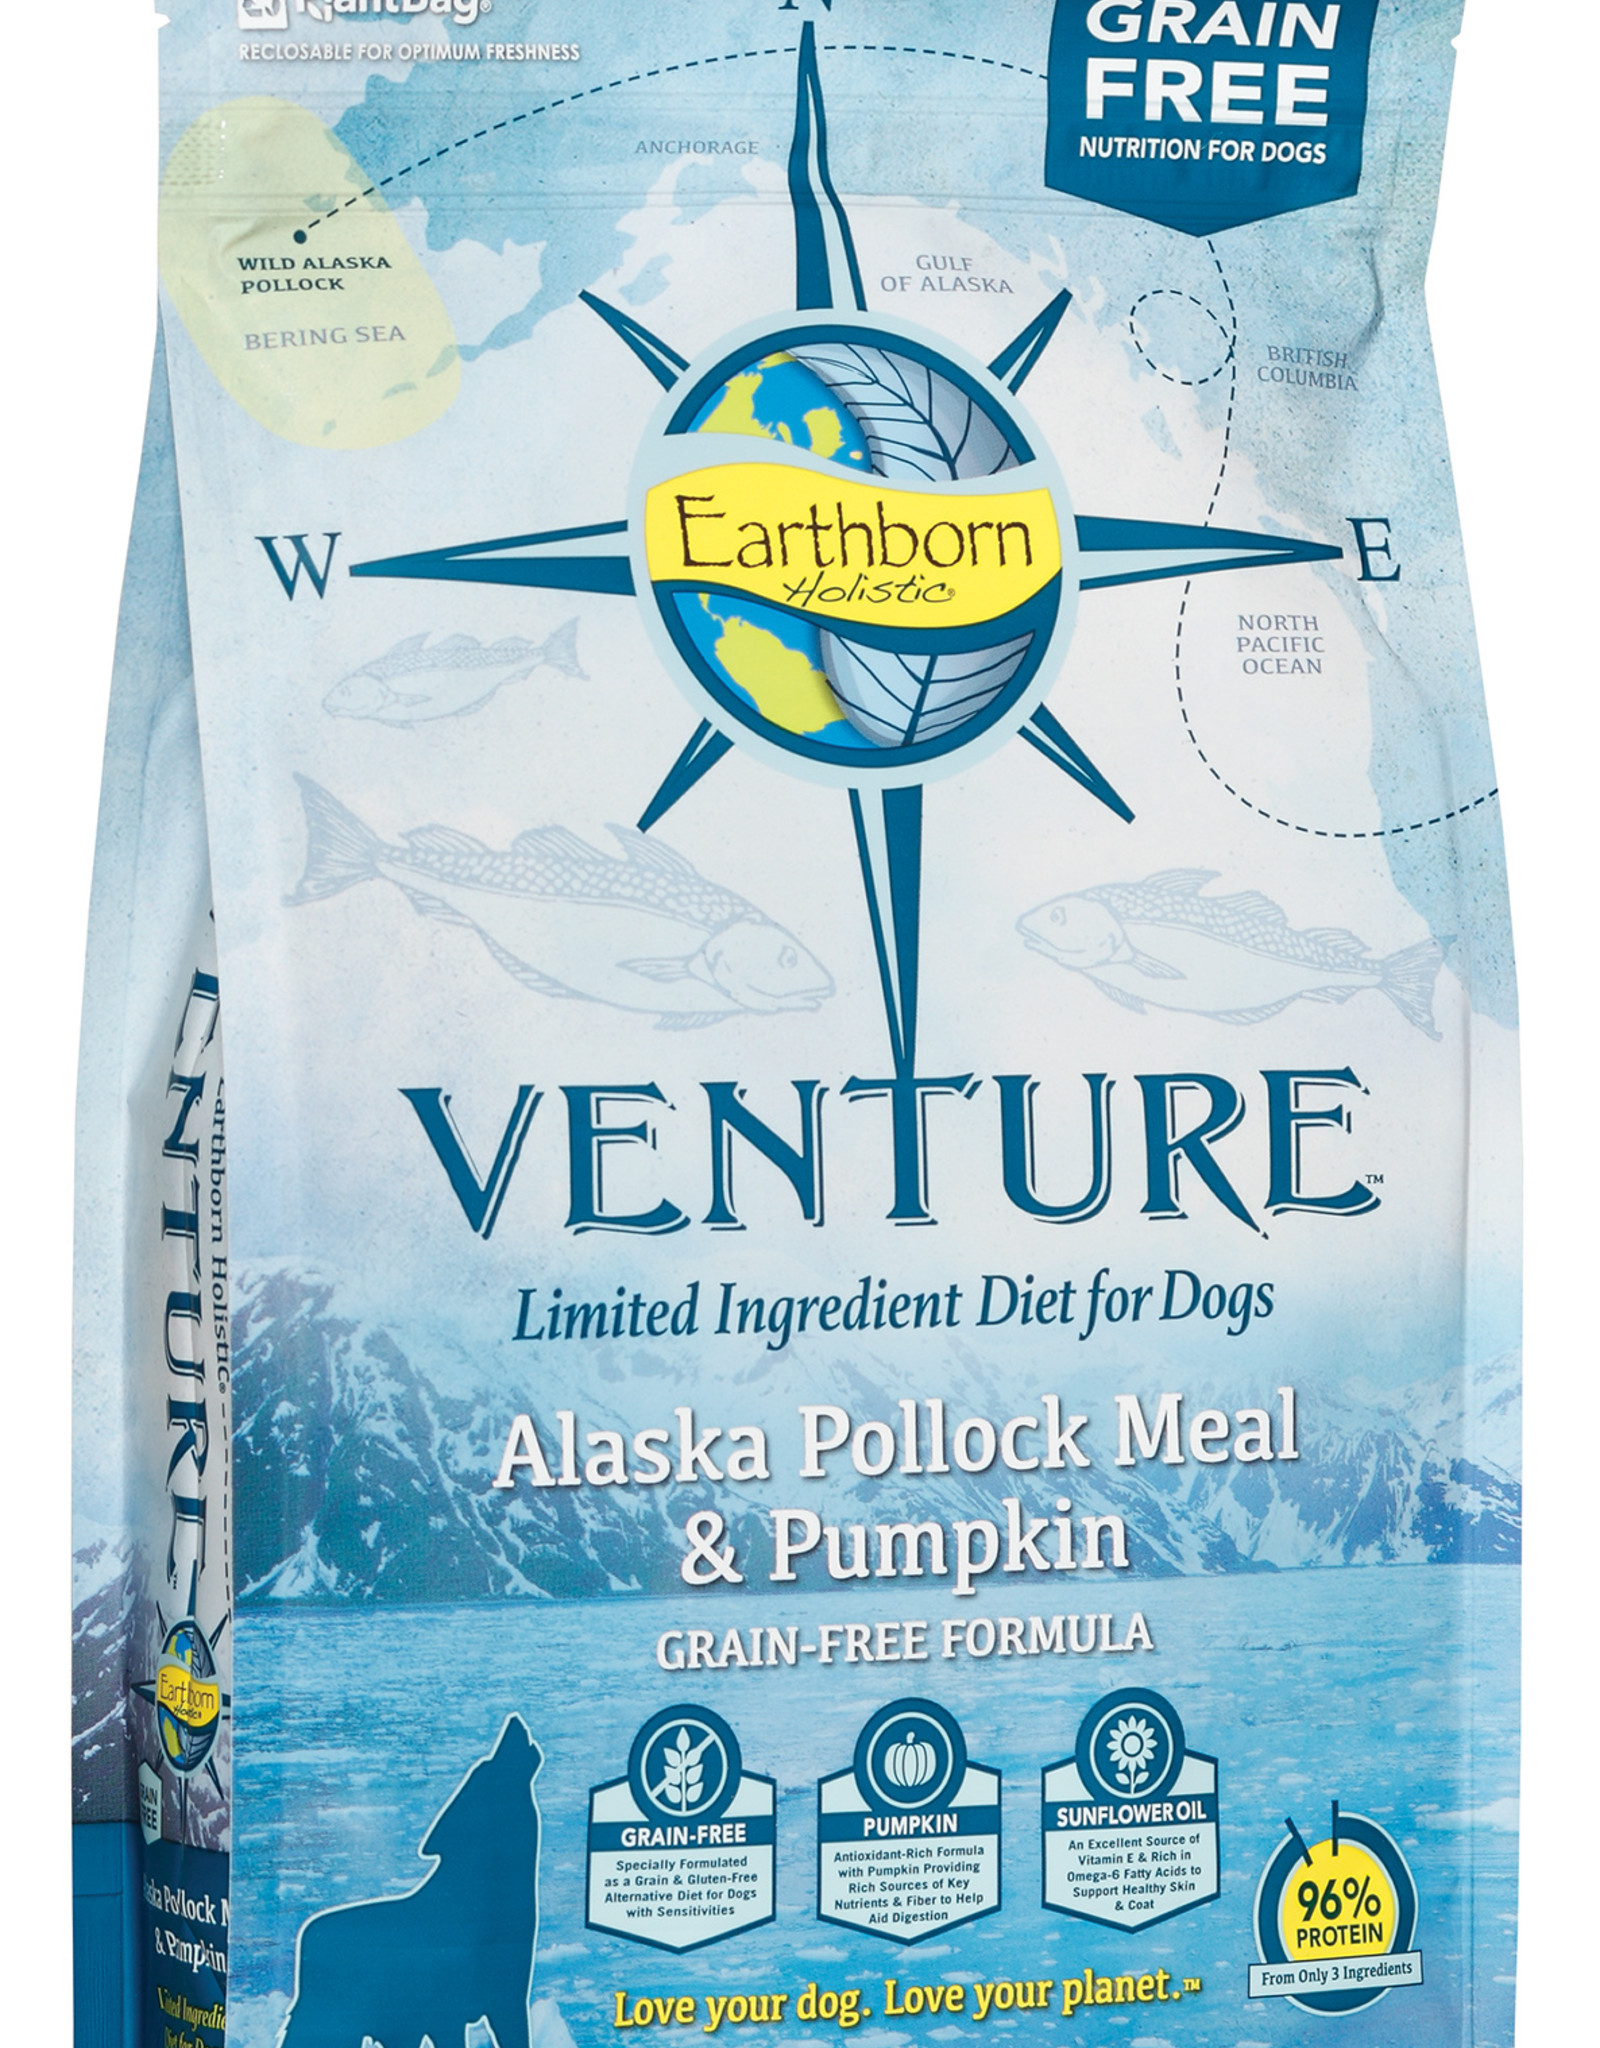 Earthborn Earthborn Venture Dog Food Alaska Pollock Meal & Pumpkin